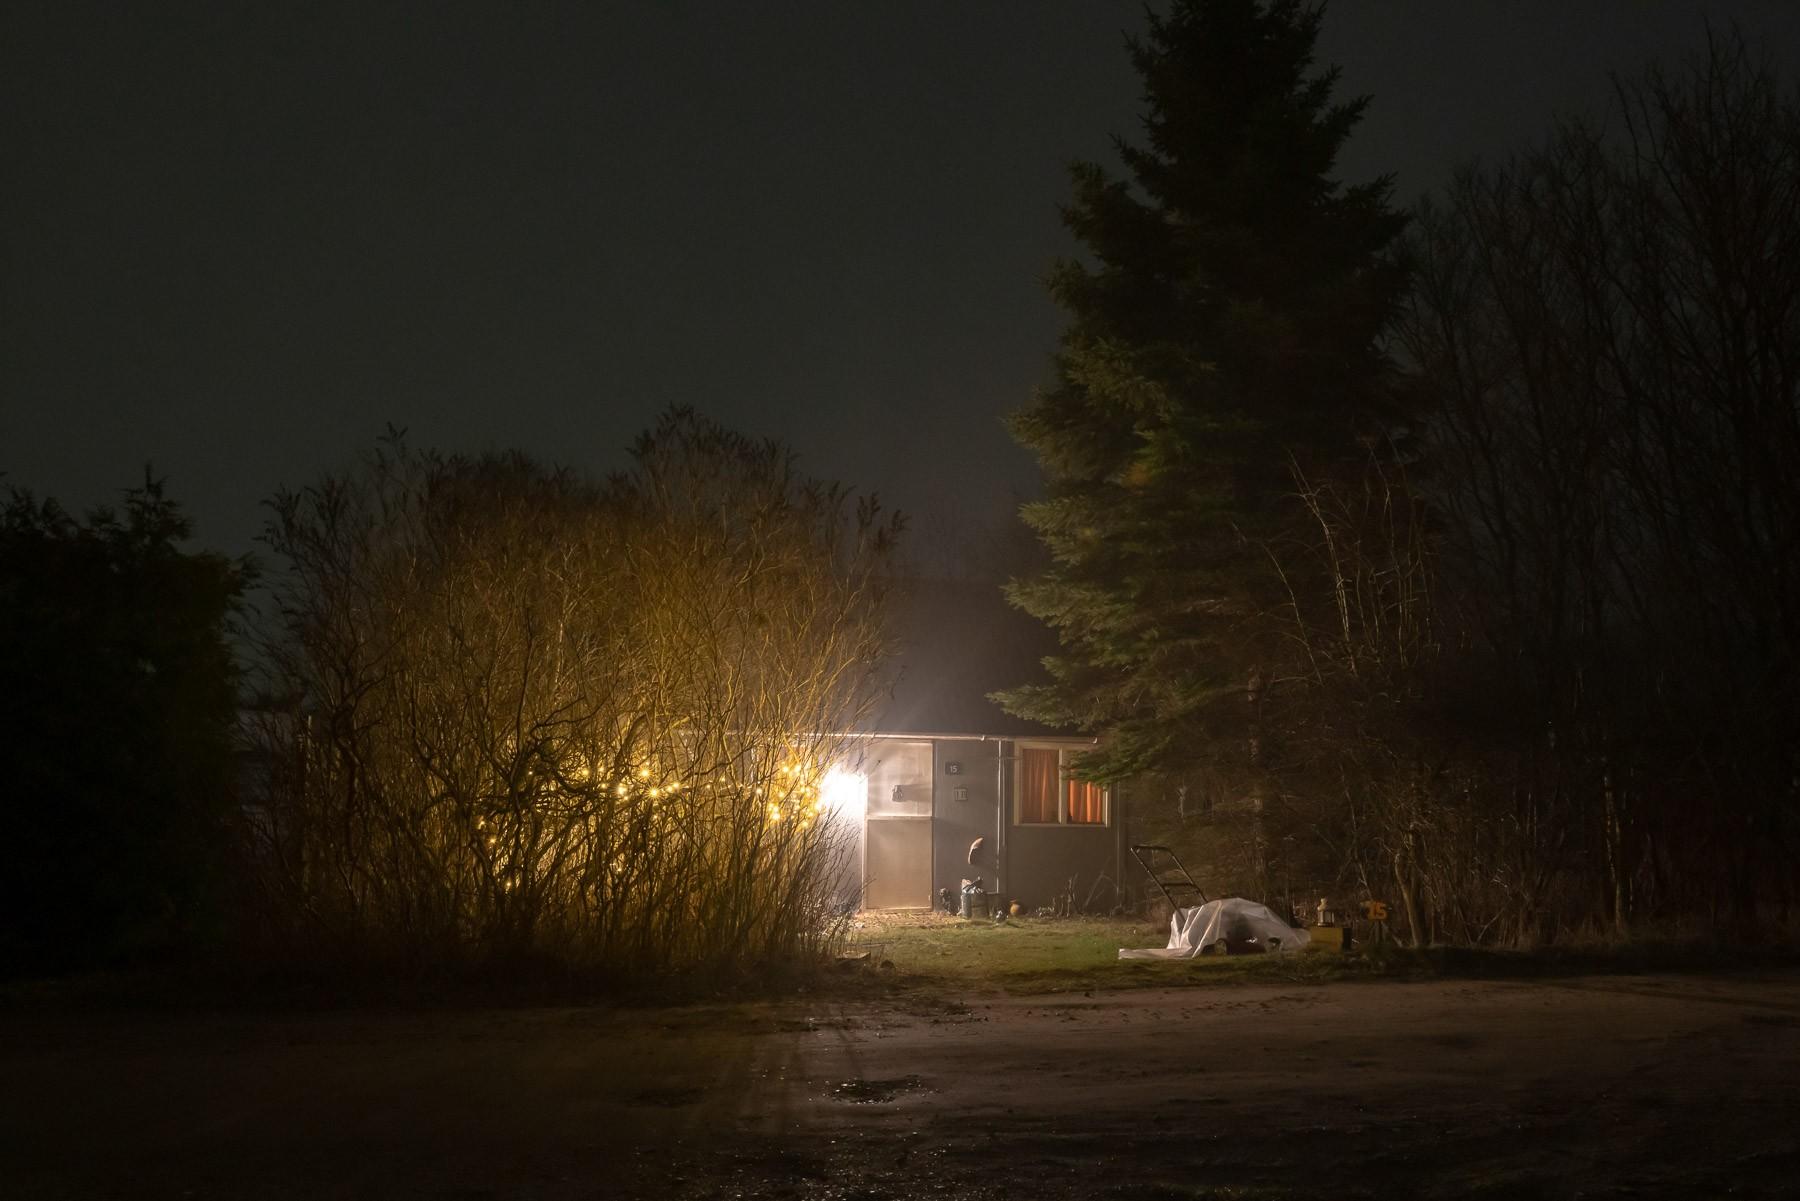 Lille, regulært hus i Haveforeningen Nokken